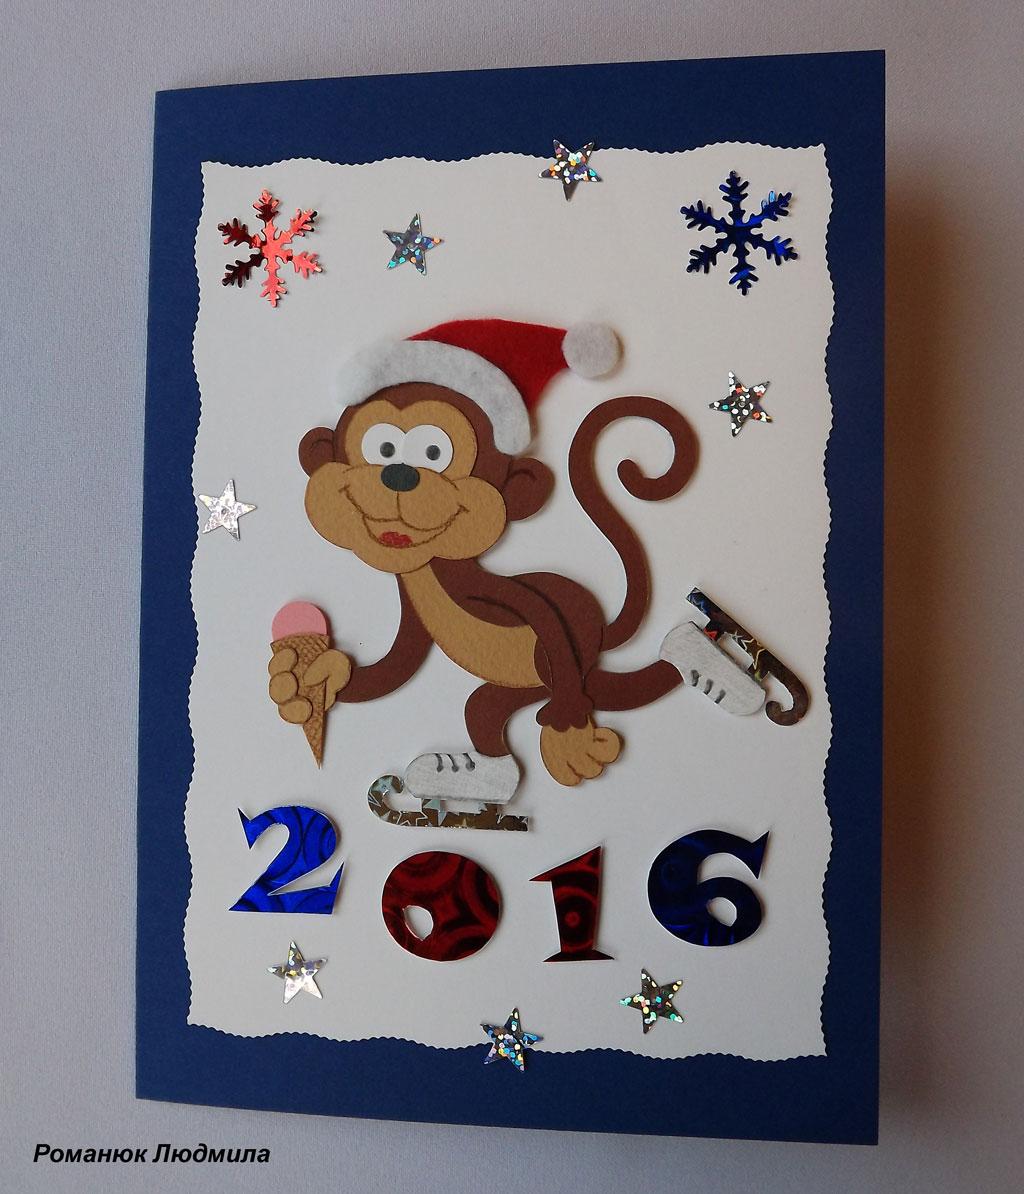 Прикол картинки, открытки обезьян к новому году 2016